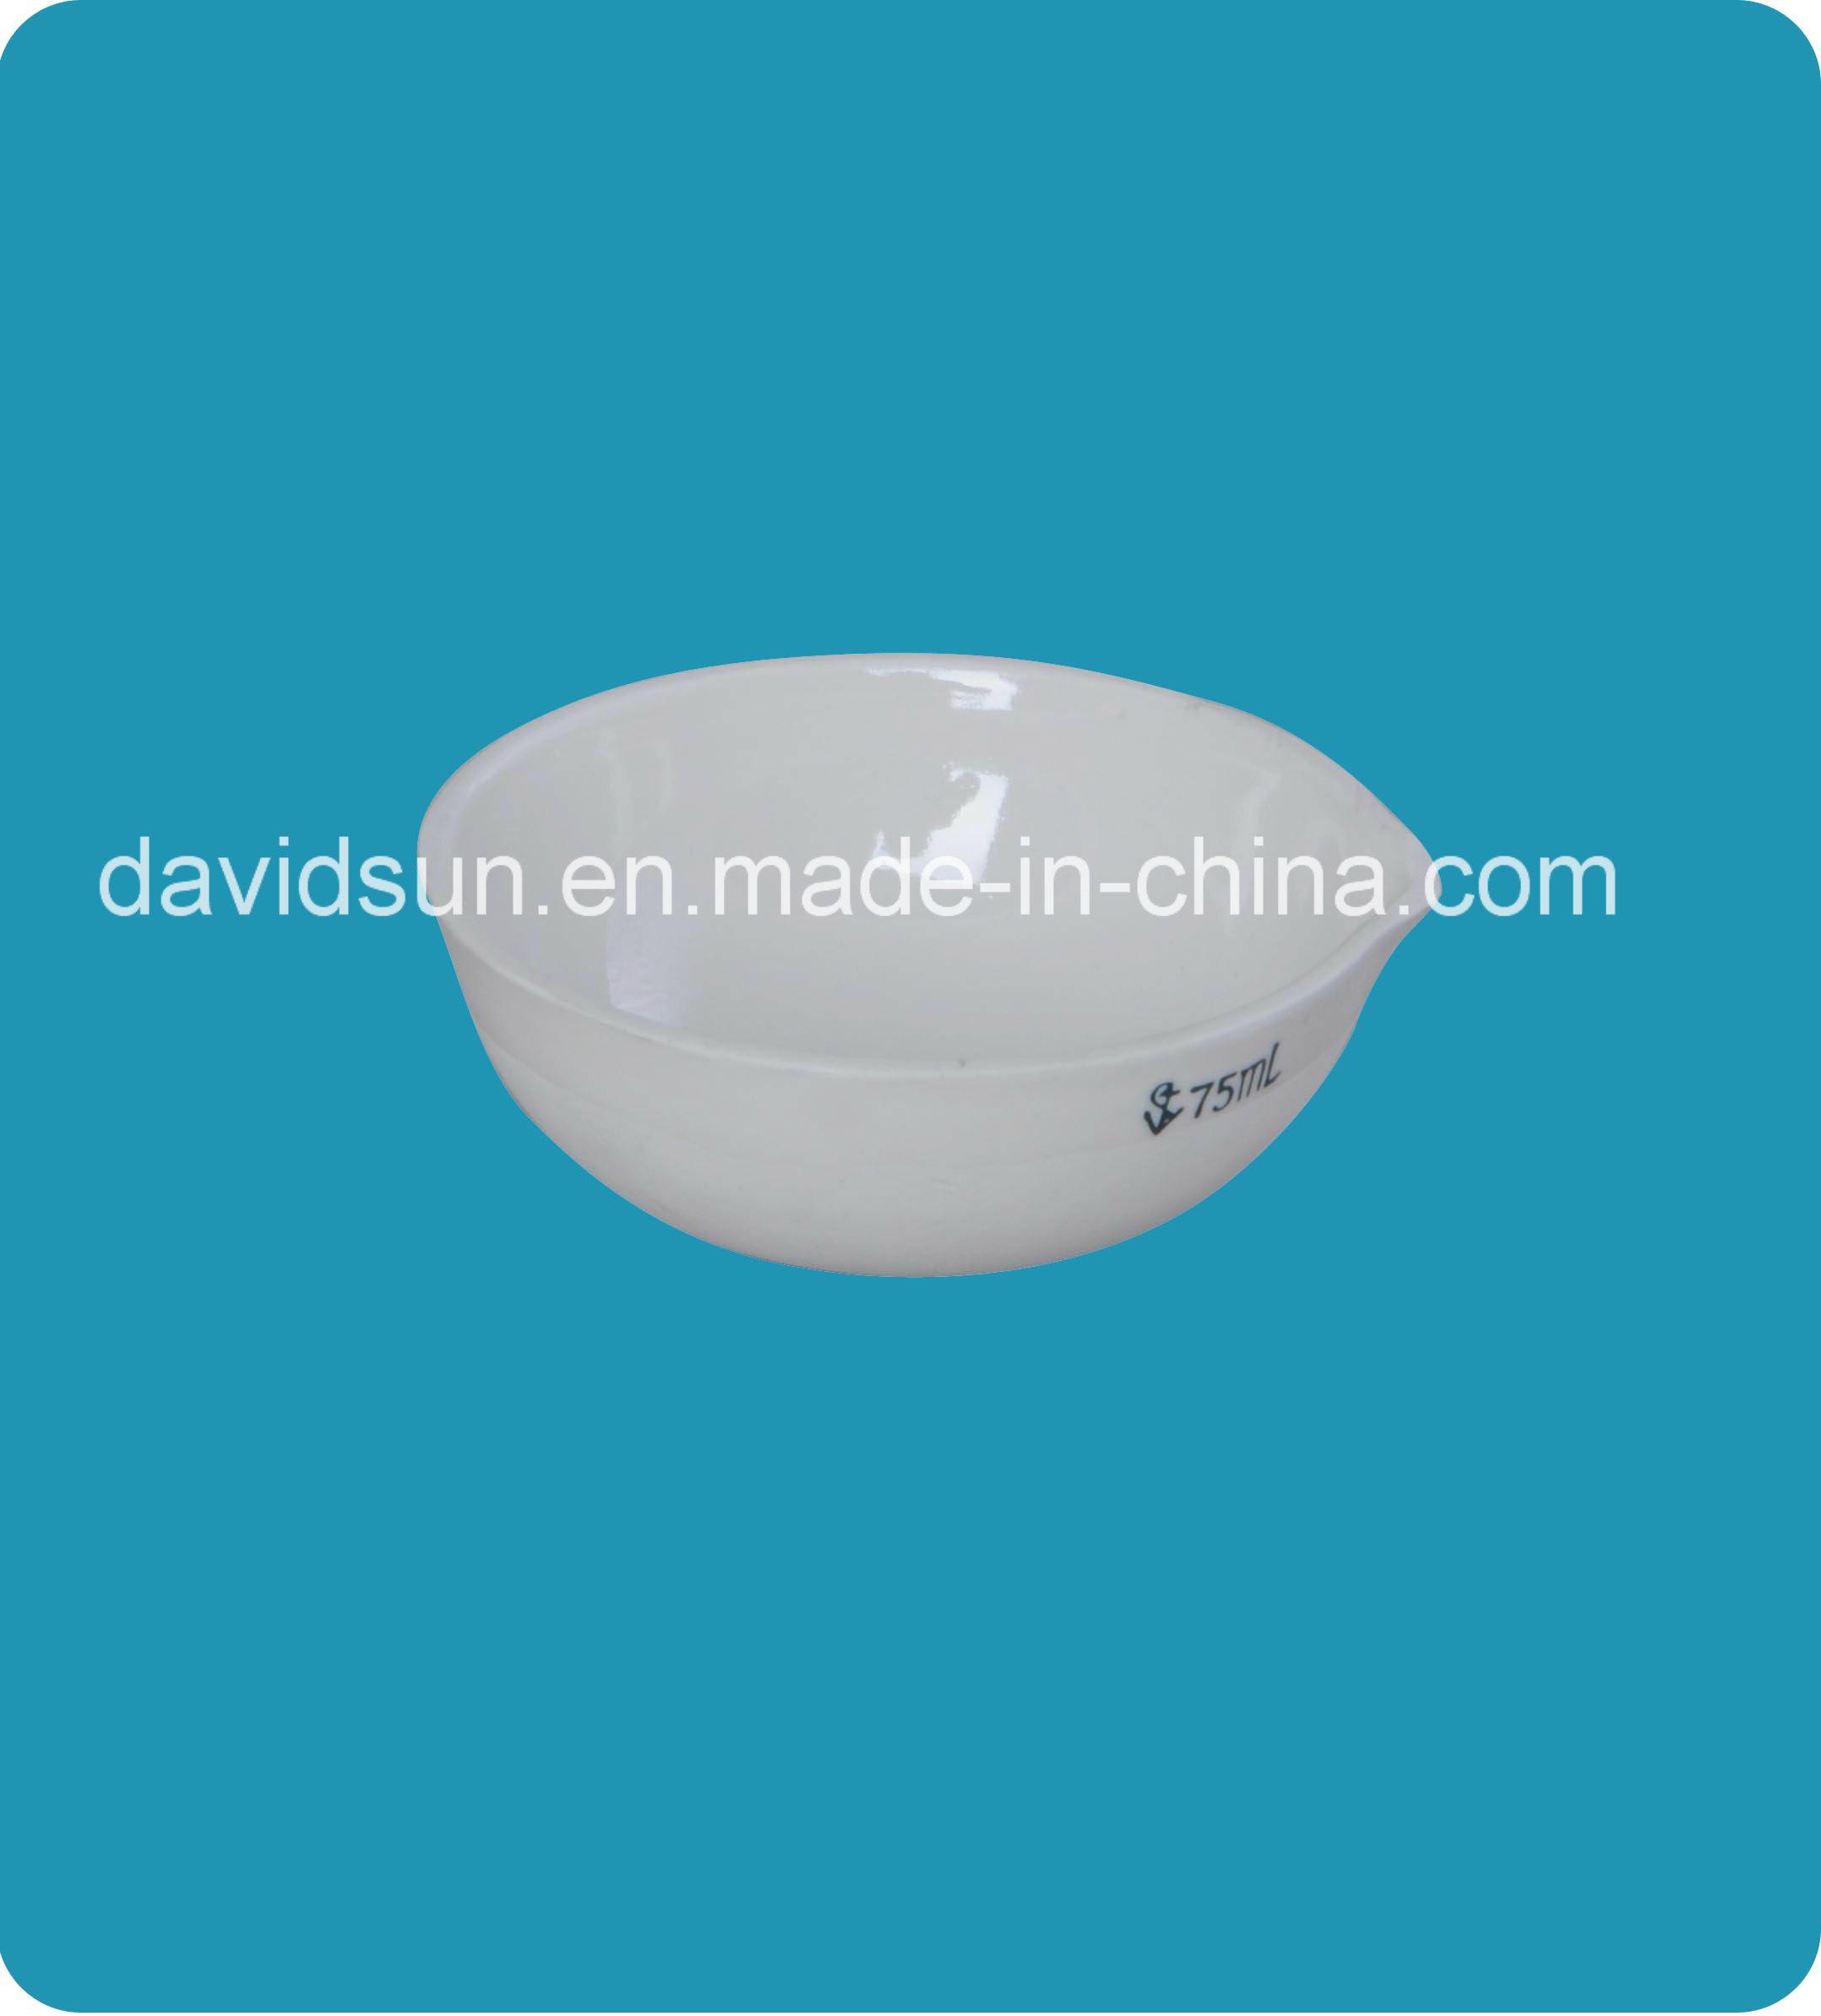 Porcelain Basins, Round Bottom with Spout, Glazed